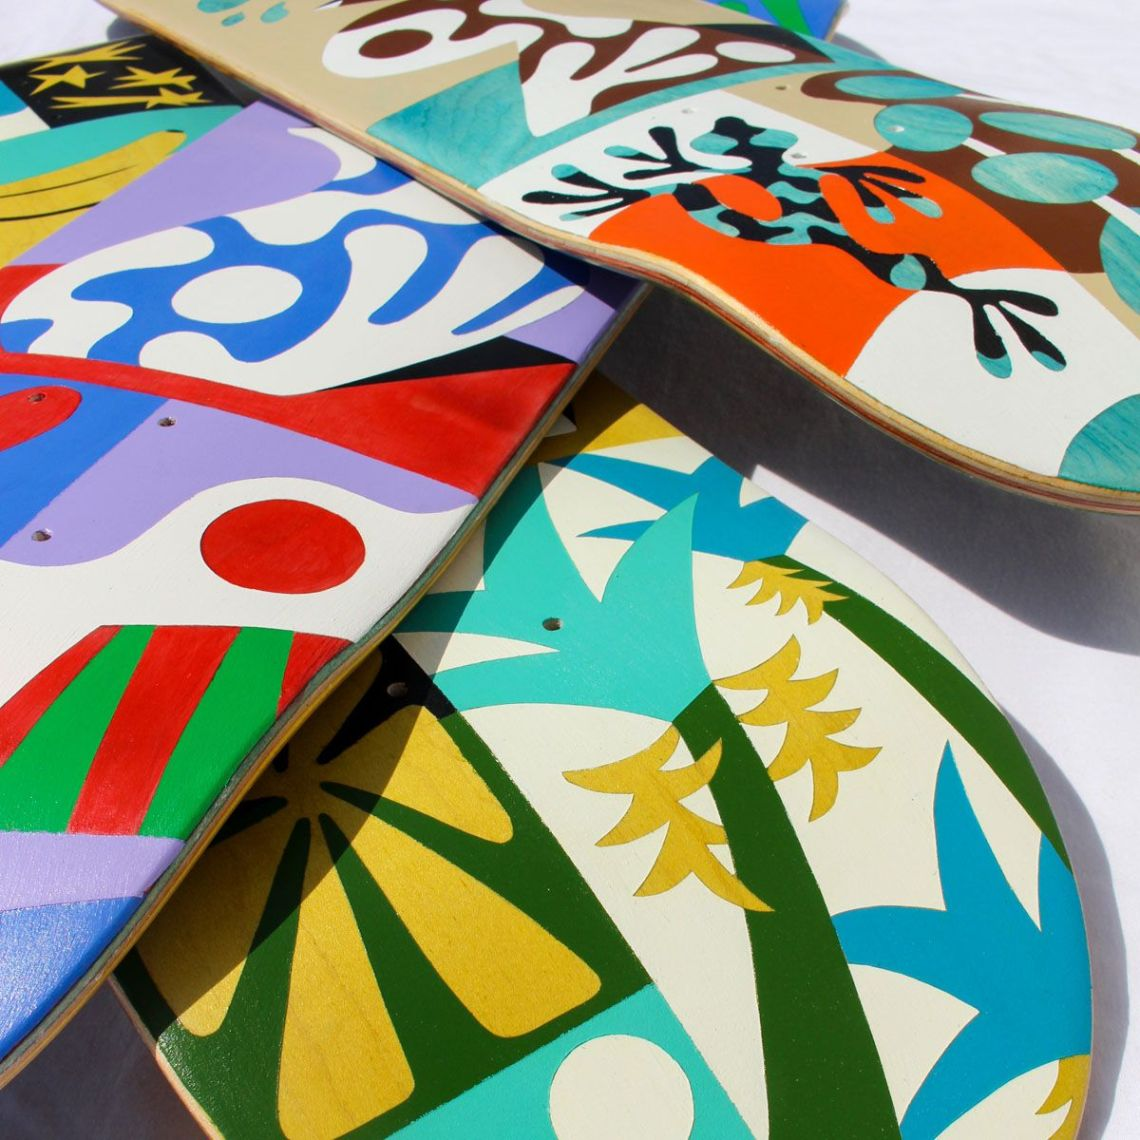 Custom Skateboards By Bart Lanzini For The European Custom Board Show 4